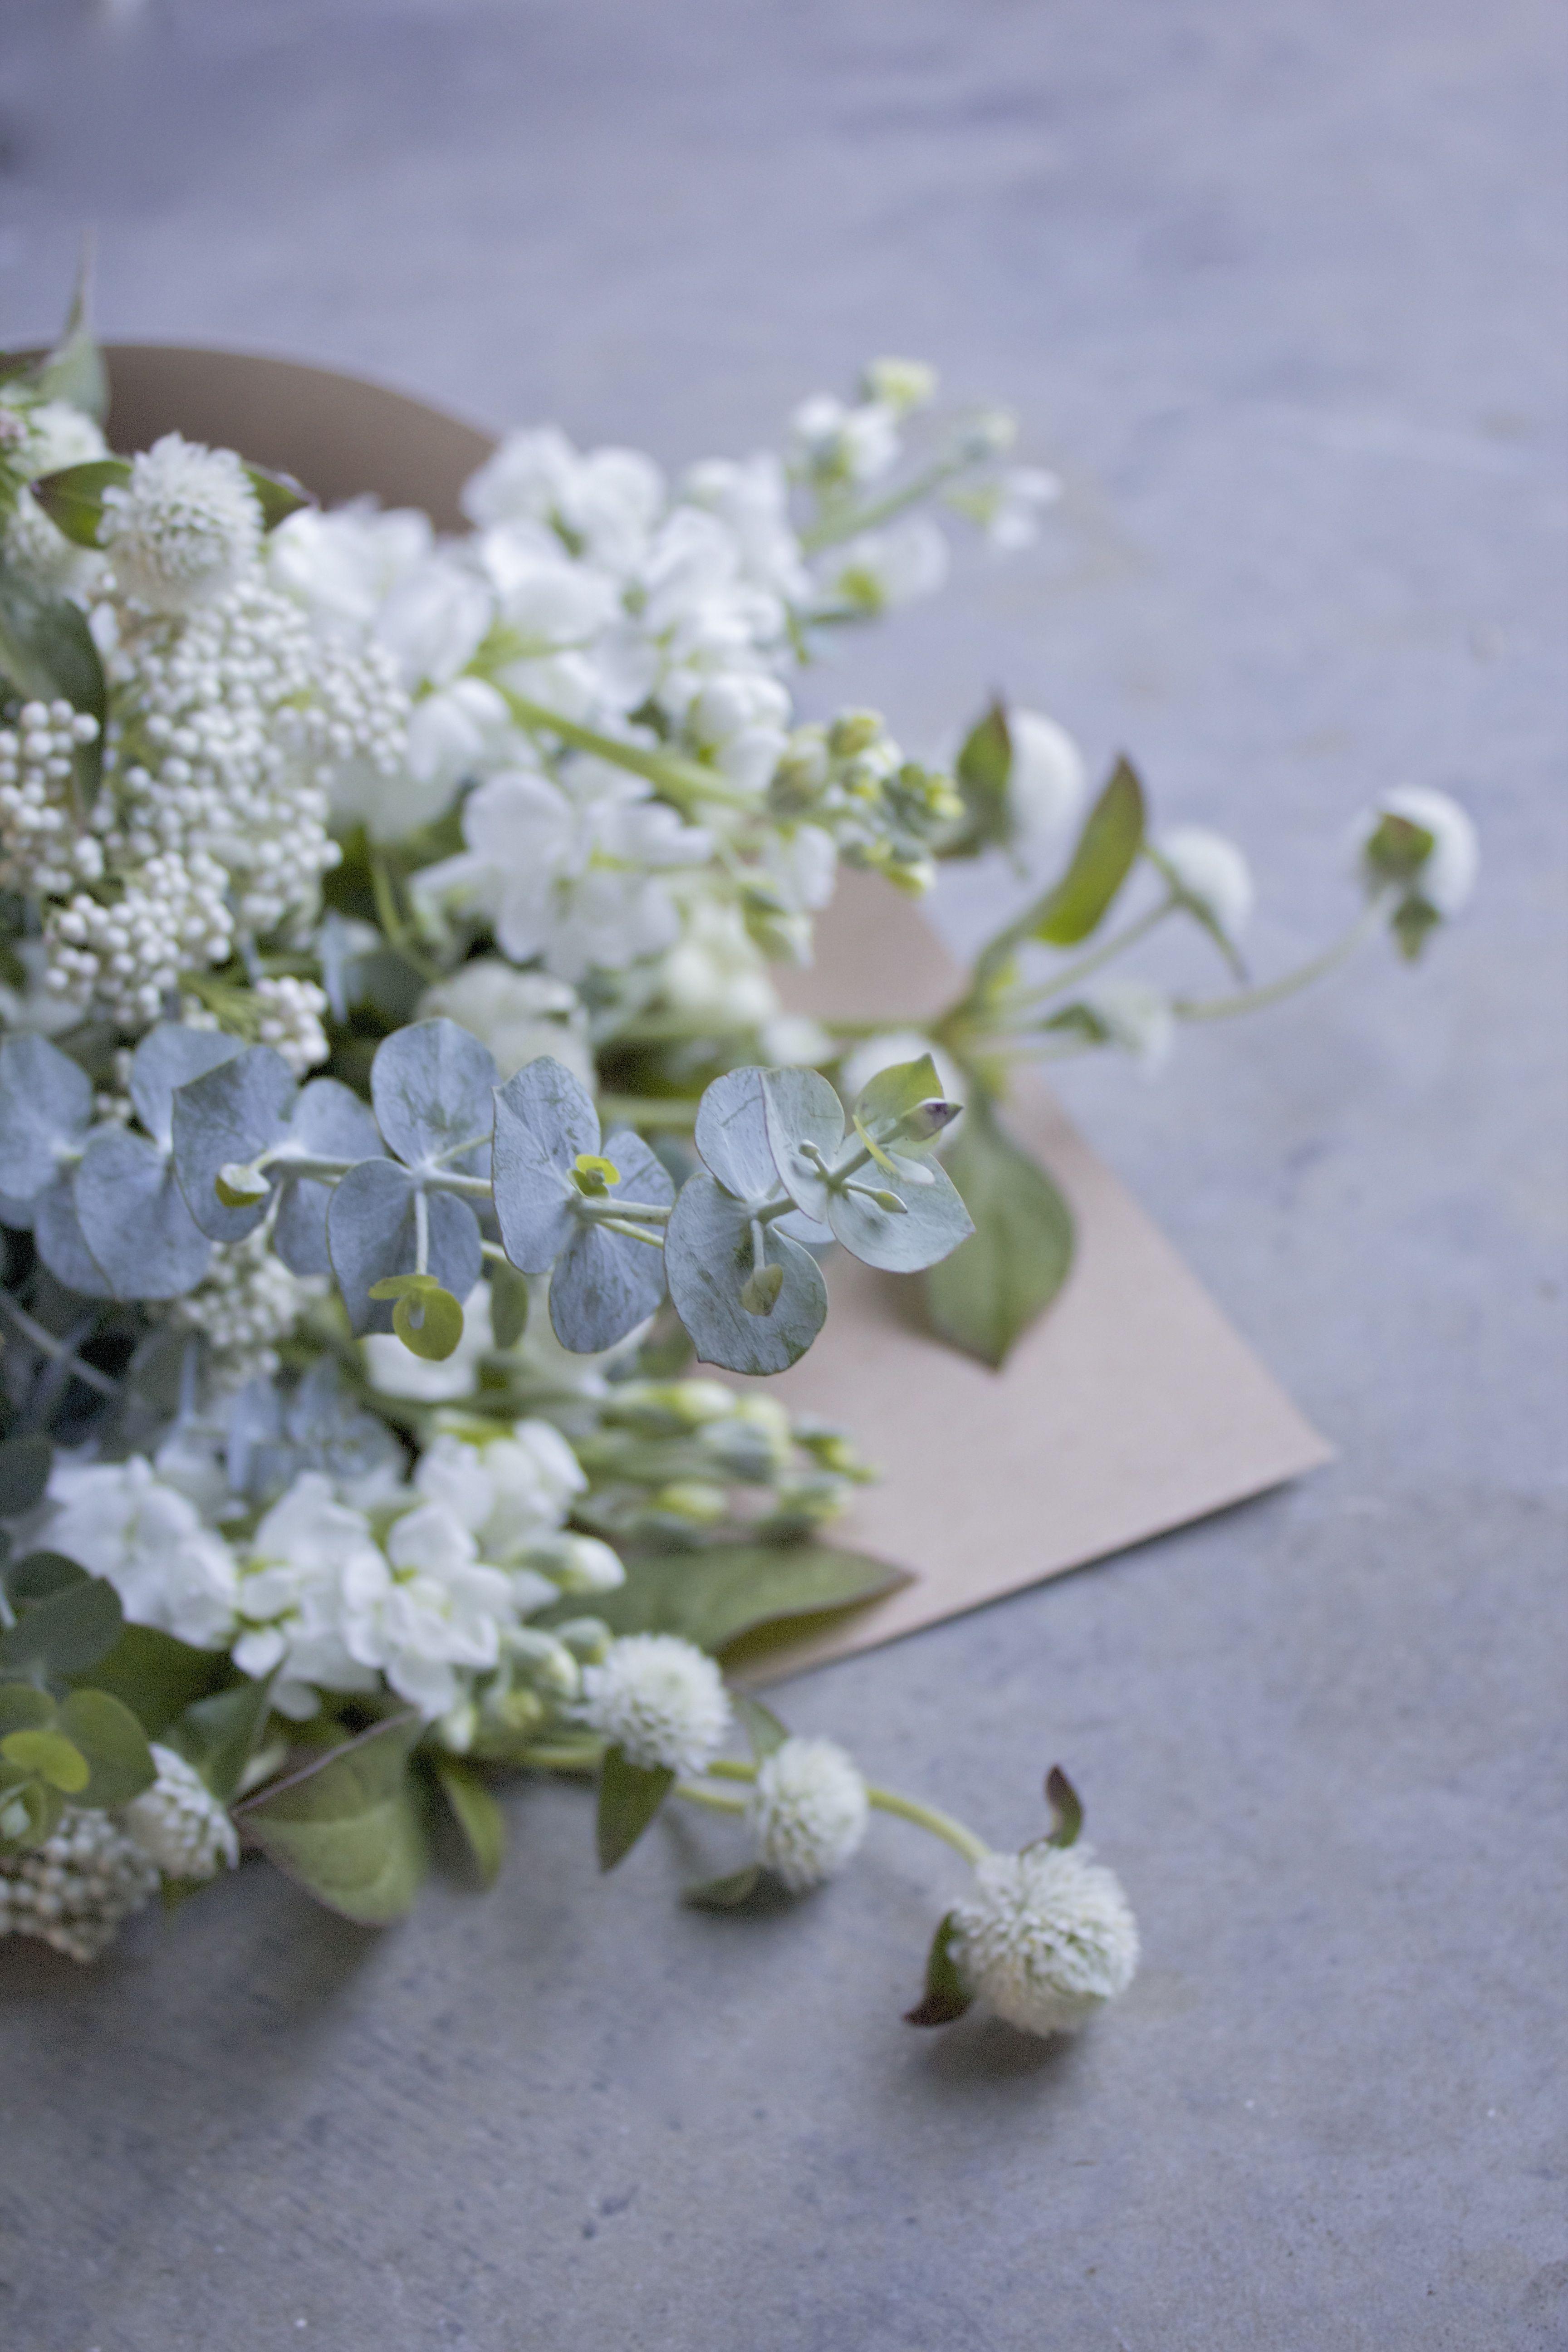 Blooms of the day bloom social flower farm flower